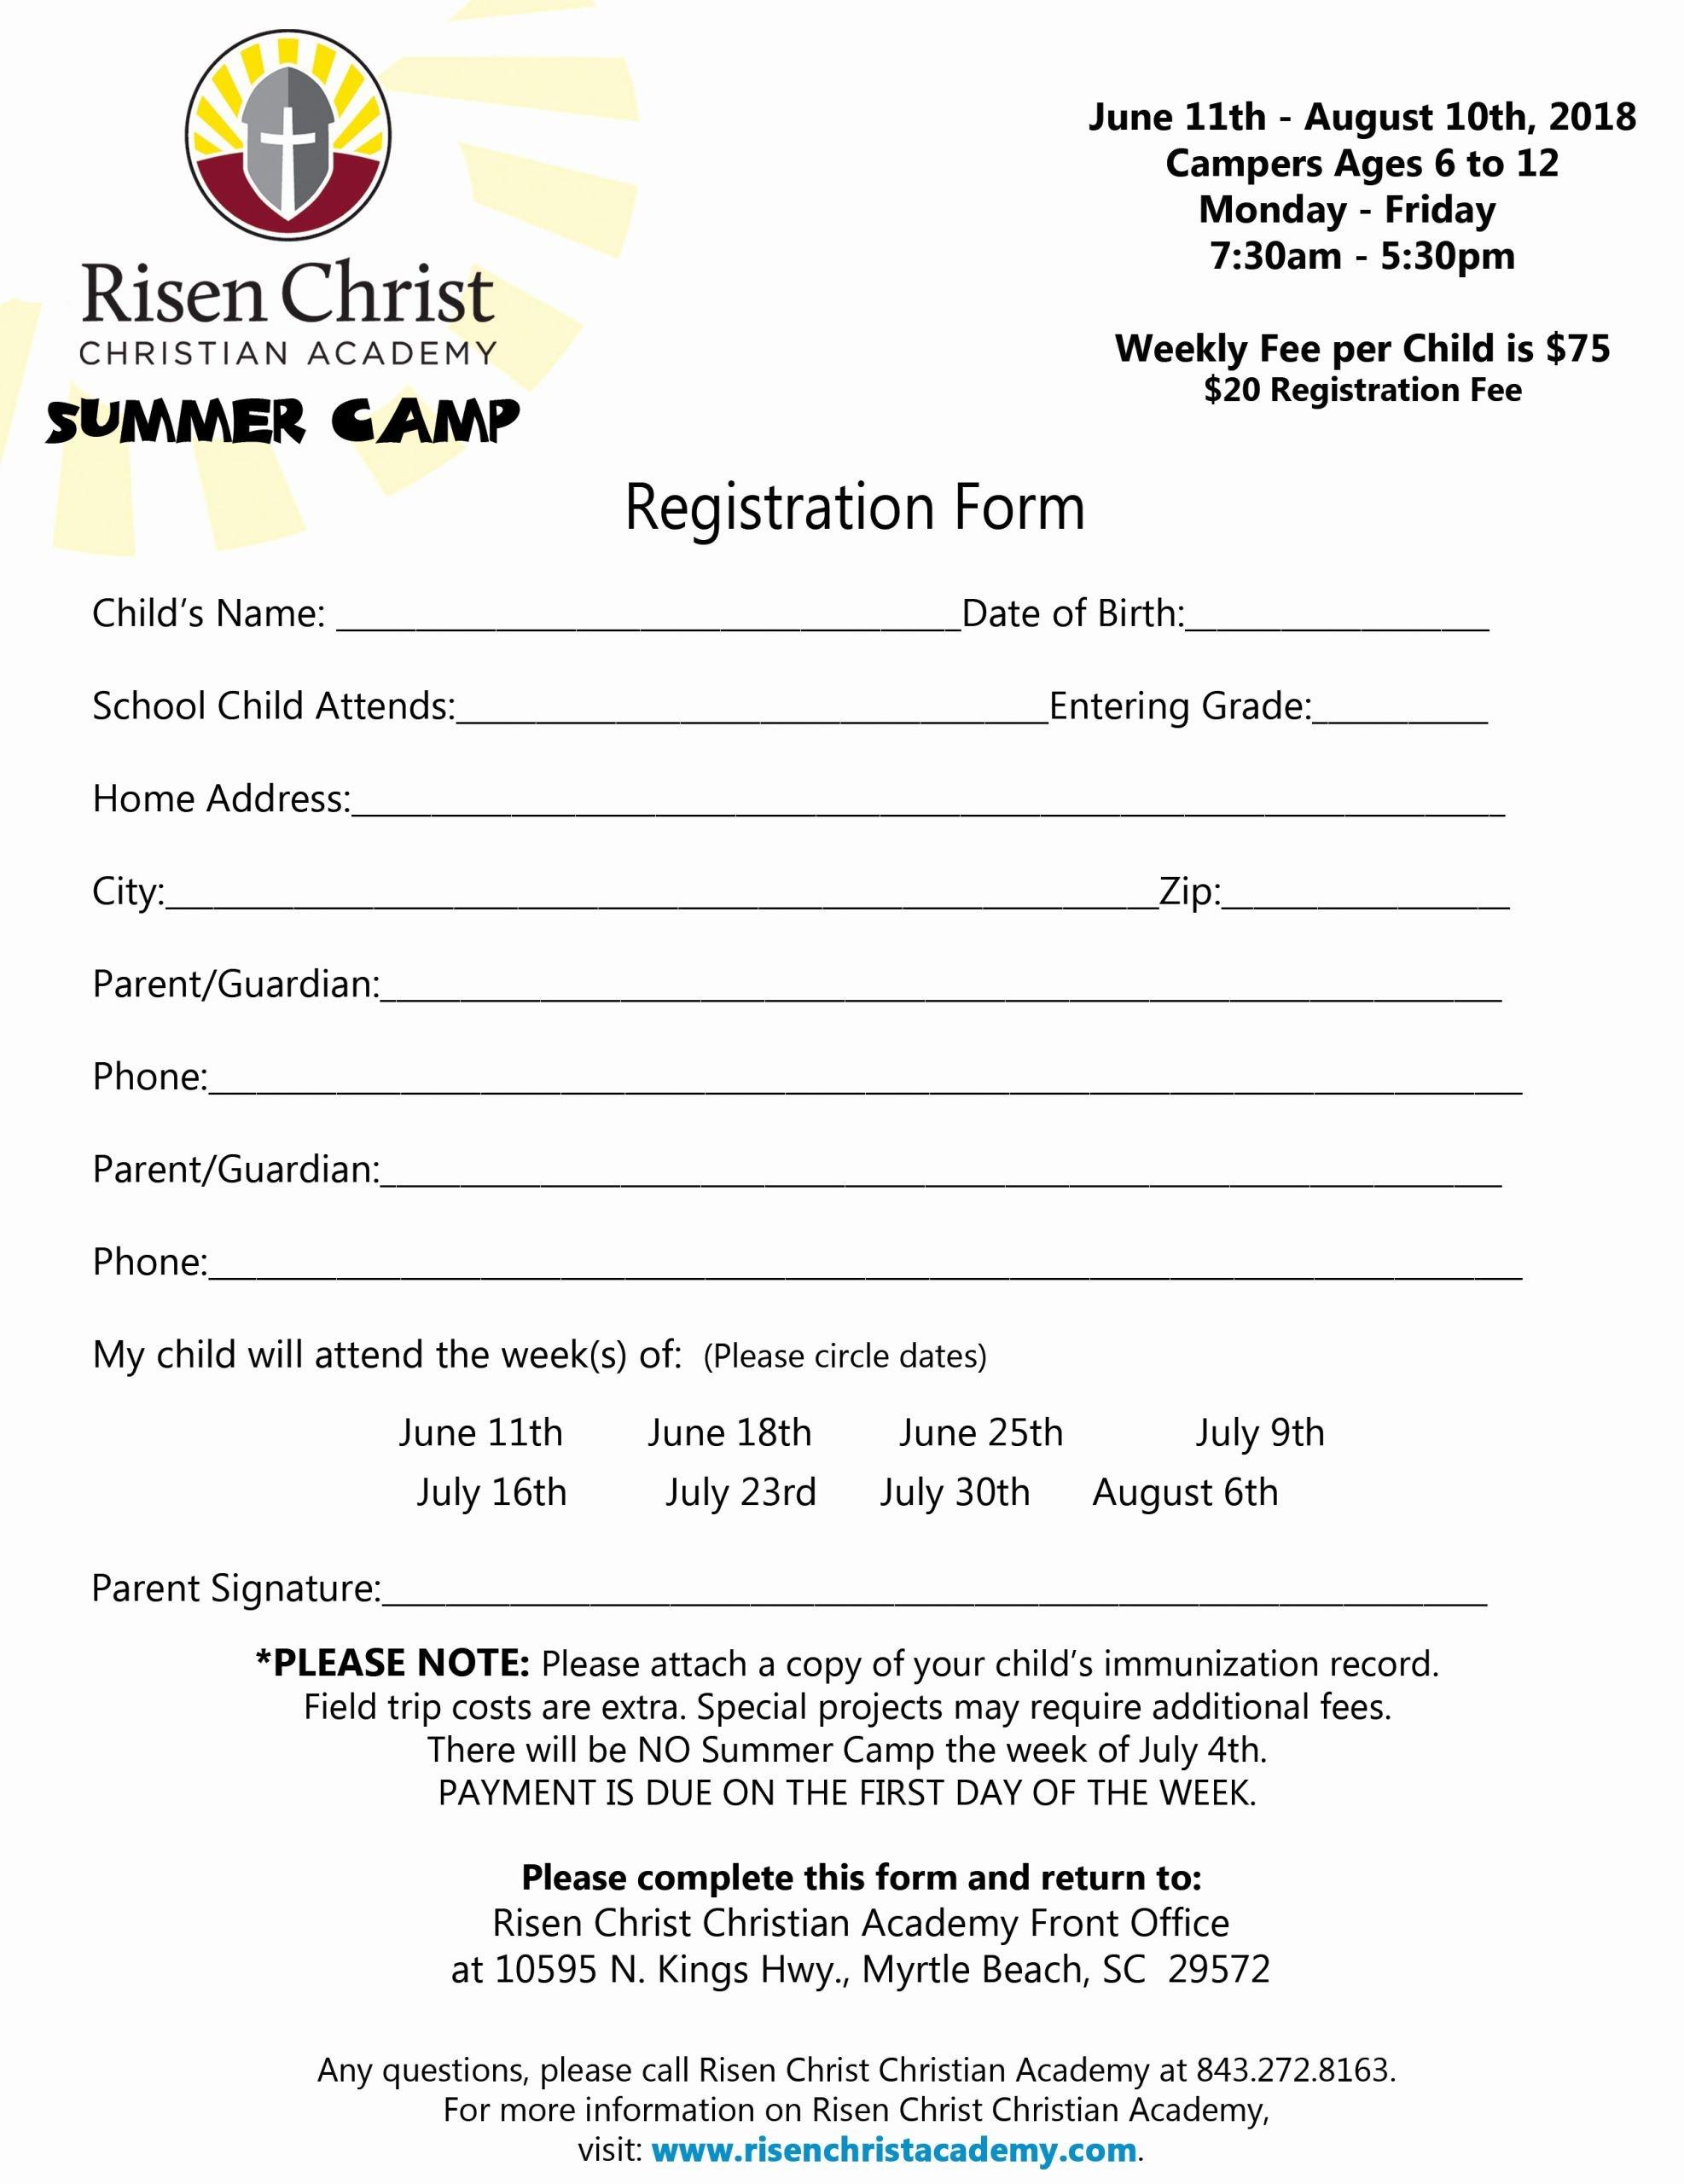 Registration form for Summer Camp Fresh Registration Risen Christ Christian Academy